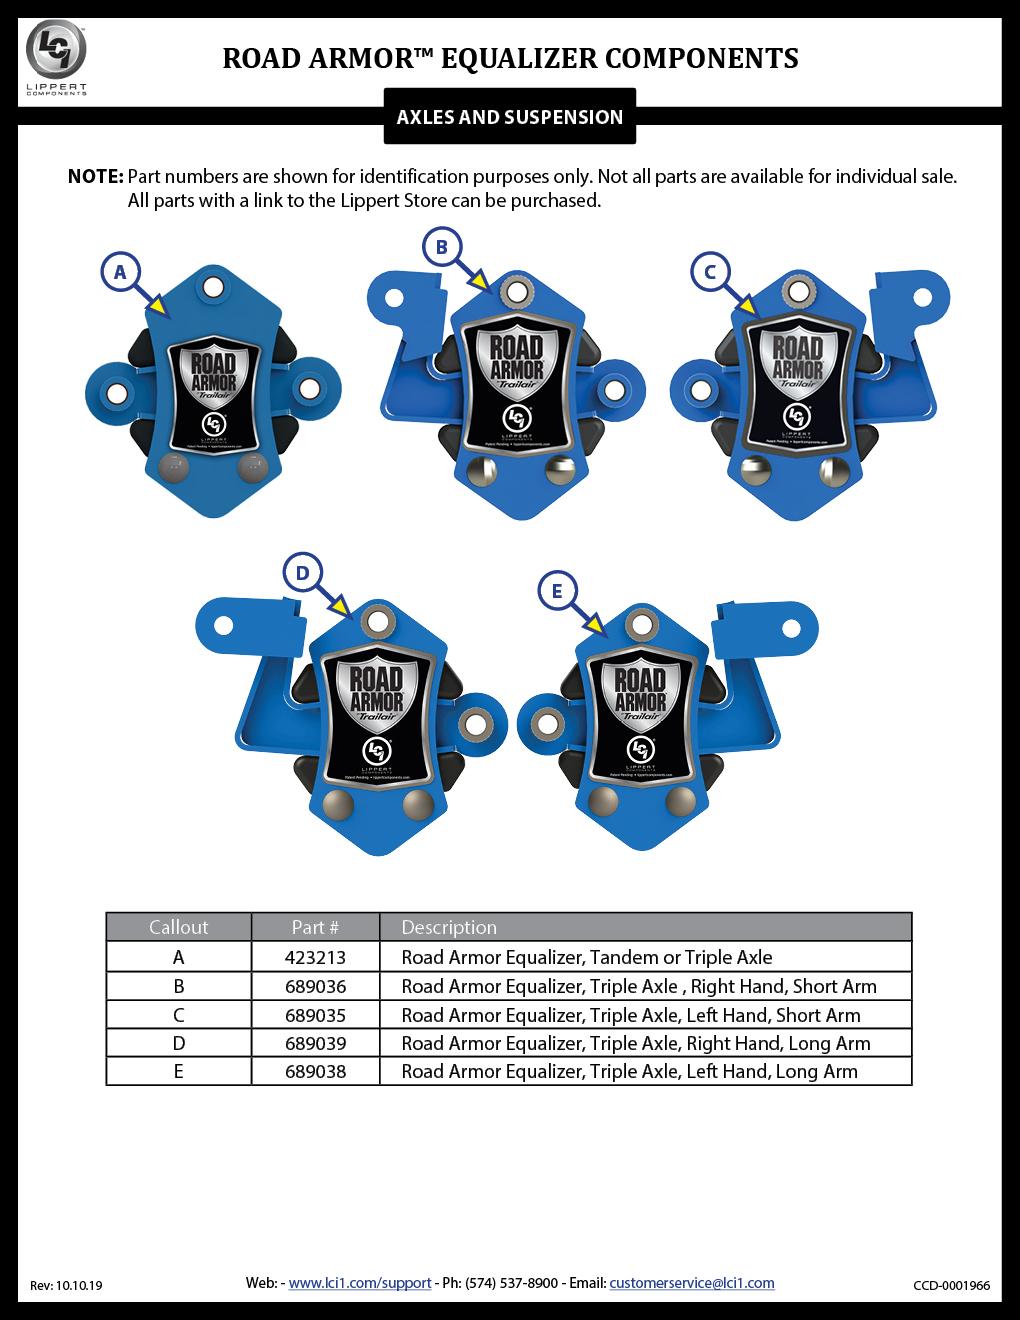 Road Armor™ Components